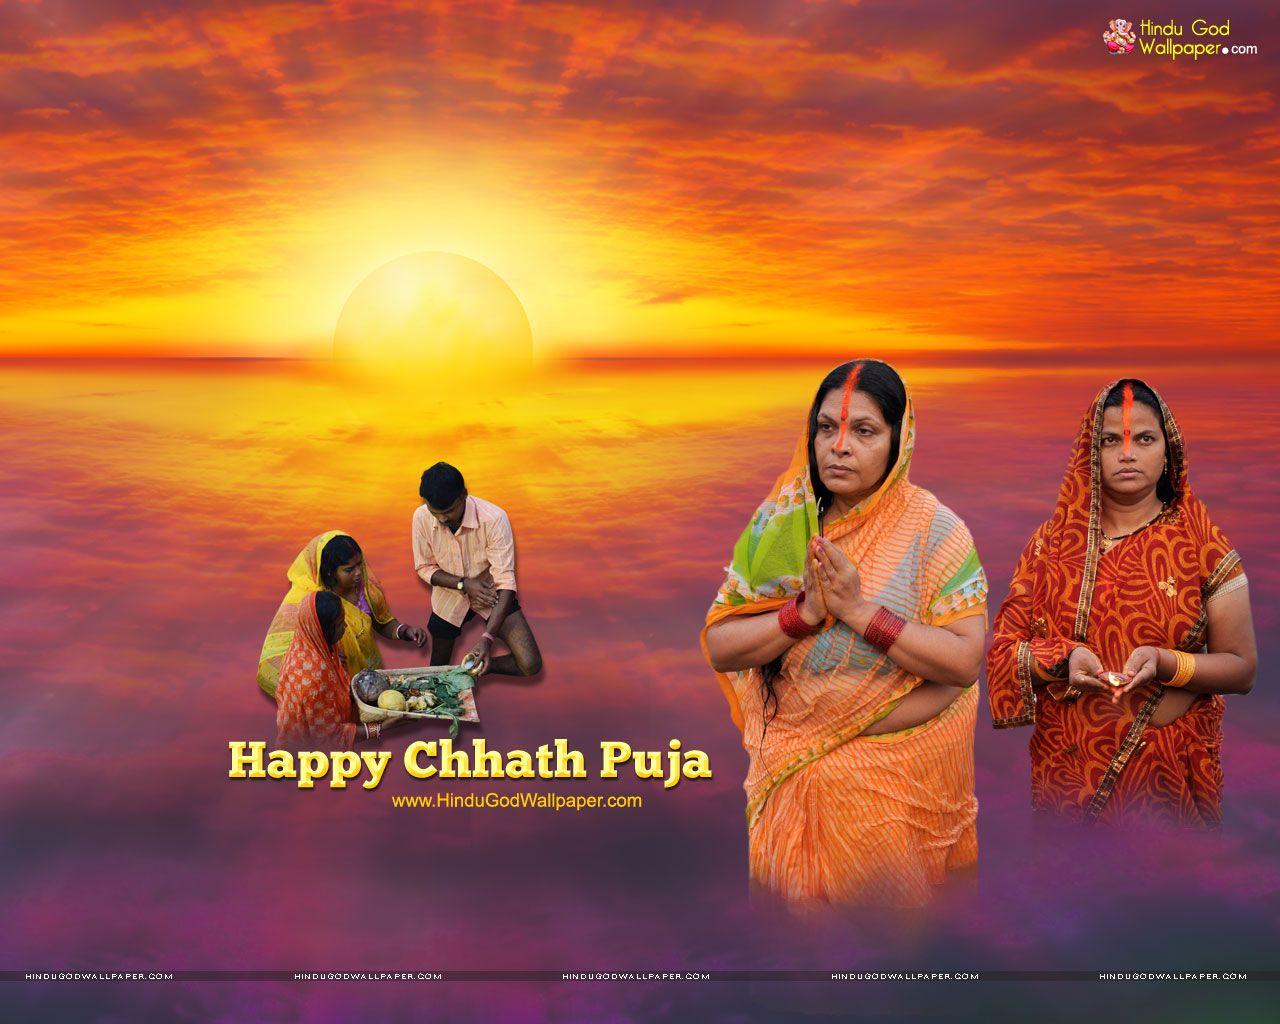 Chhath Puja Hd Wallpaper For Desktop Free Download Desktops